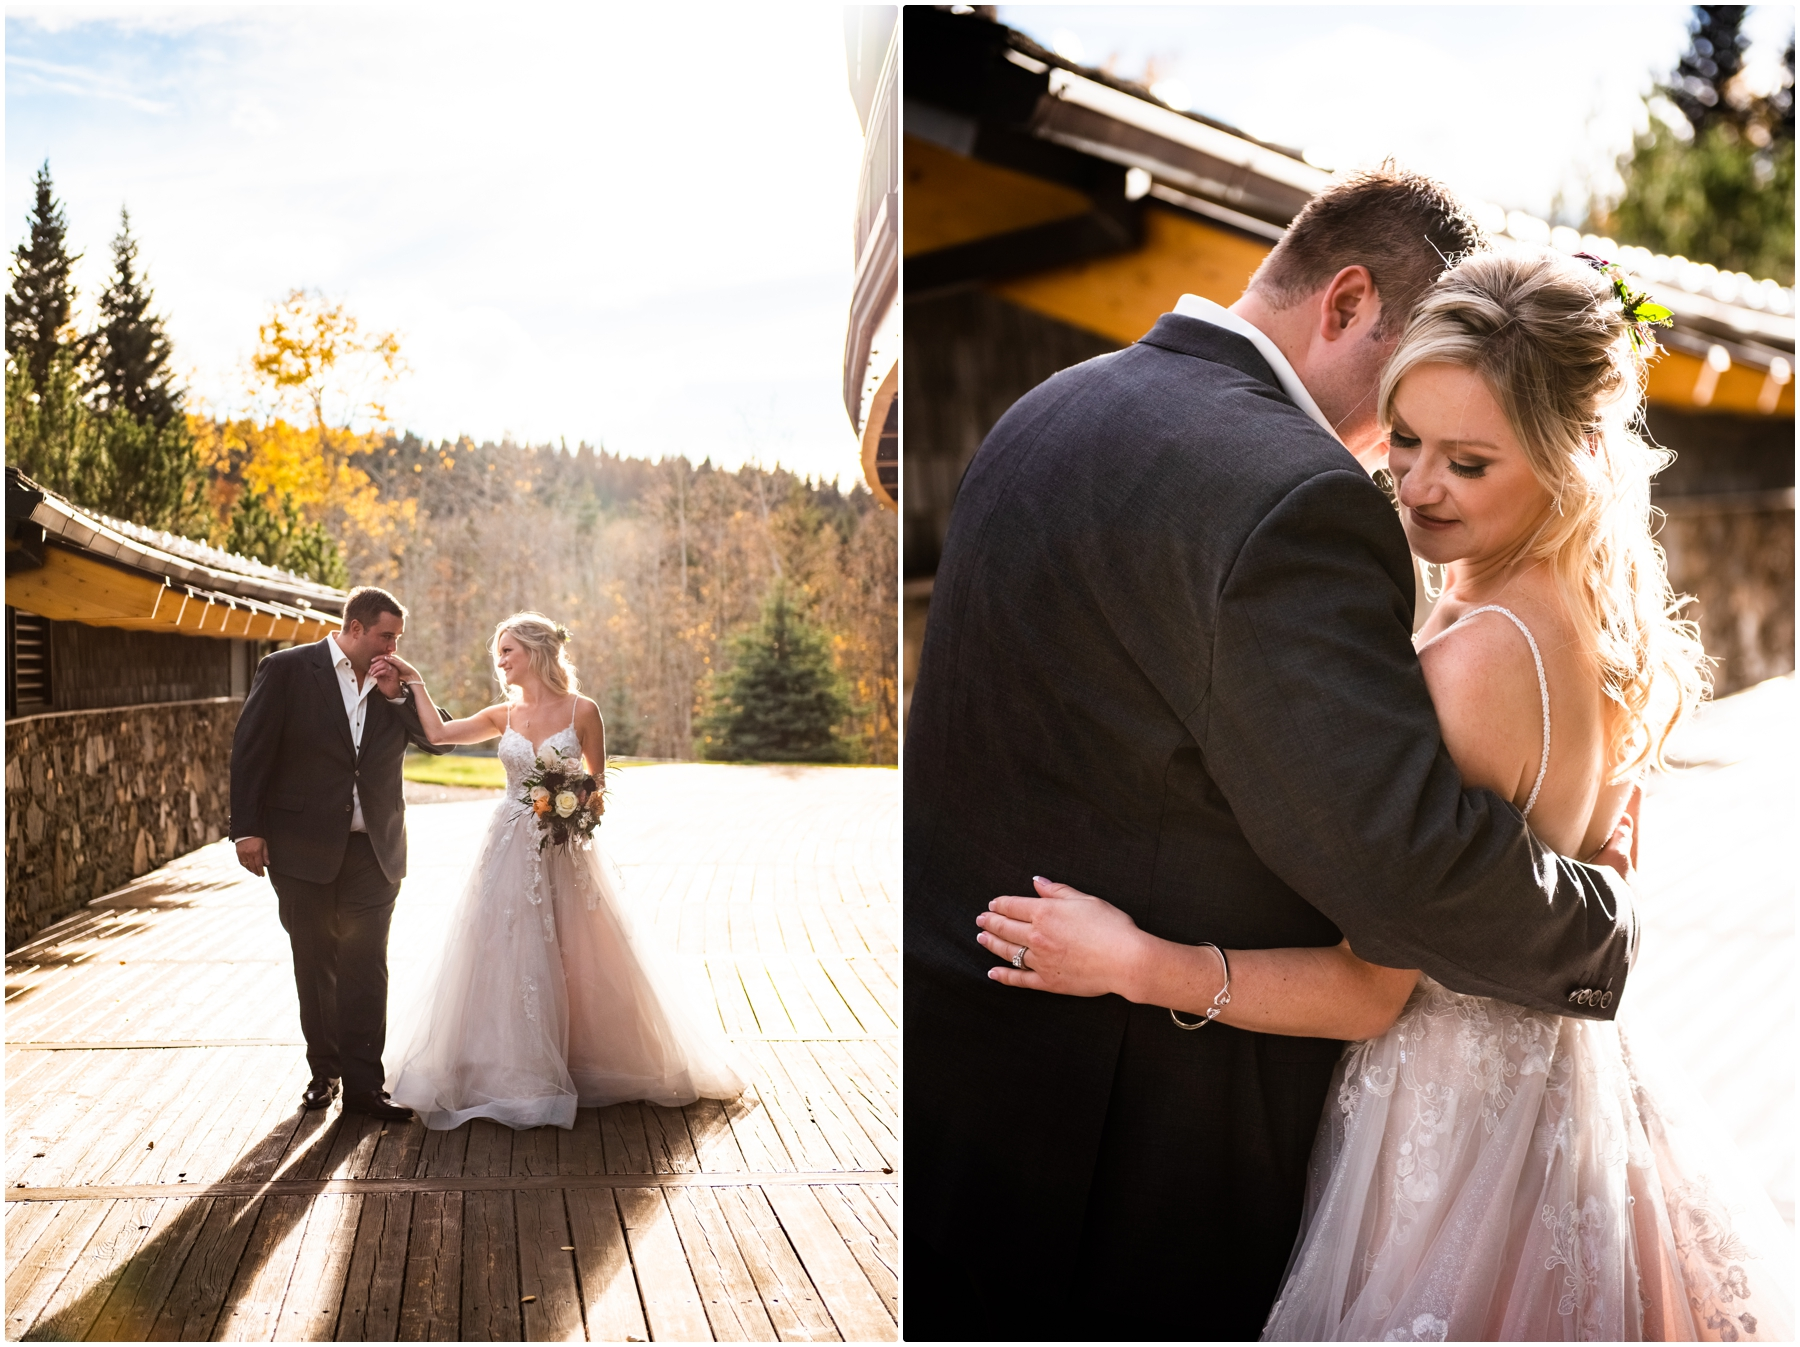 Calgary Wedding Photography - Azuridge Estate Hotel Wedding Photos